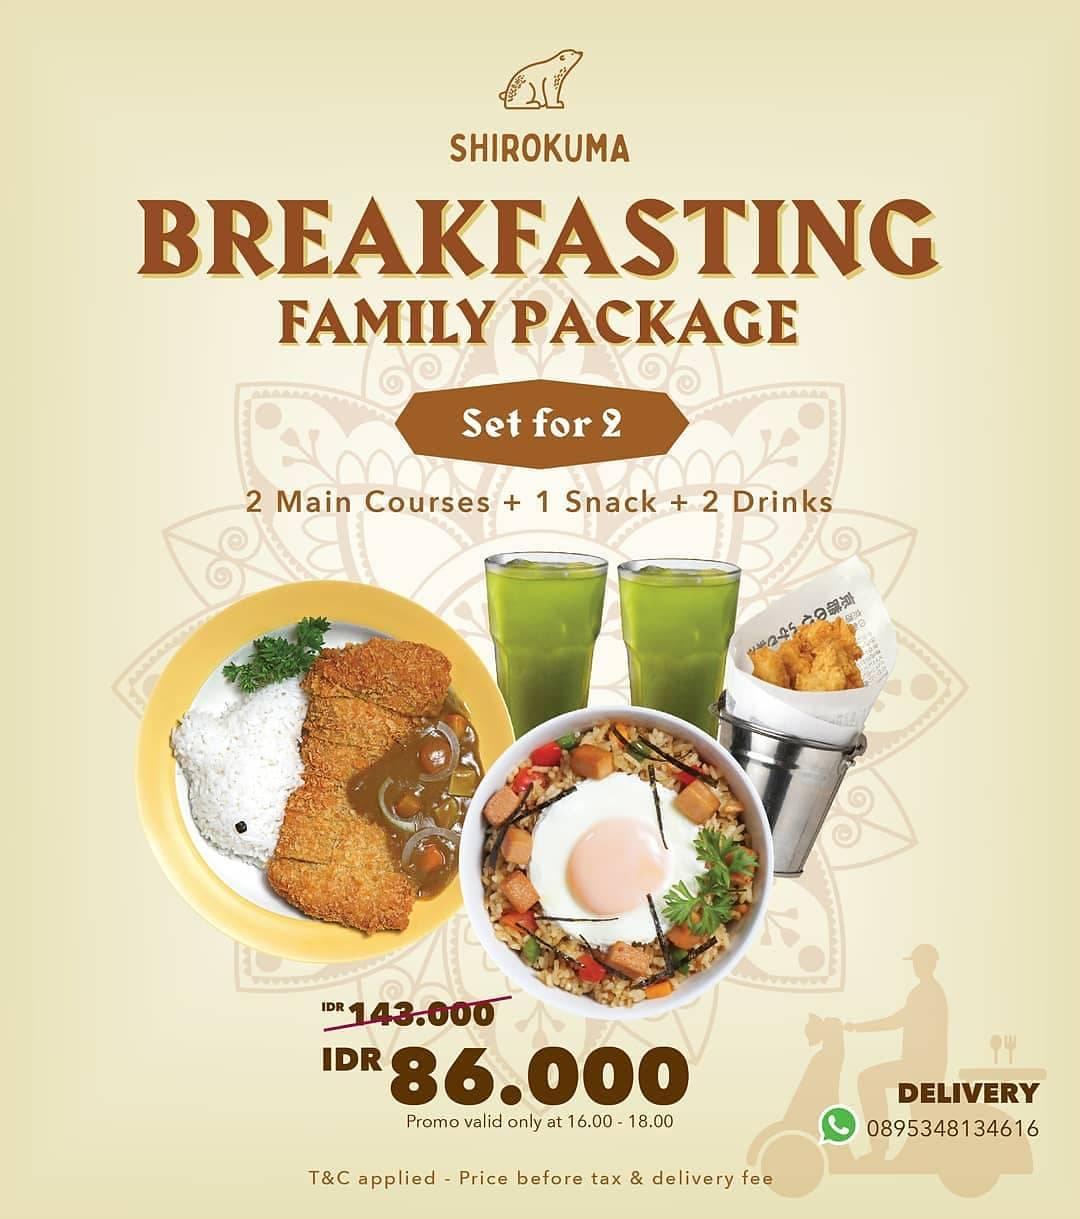 Diskon Shirokuma Promo Breakfasting Family Package Dengan Harga Mulai Rp. 86.000